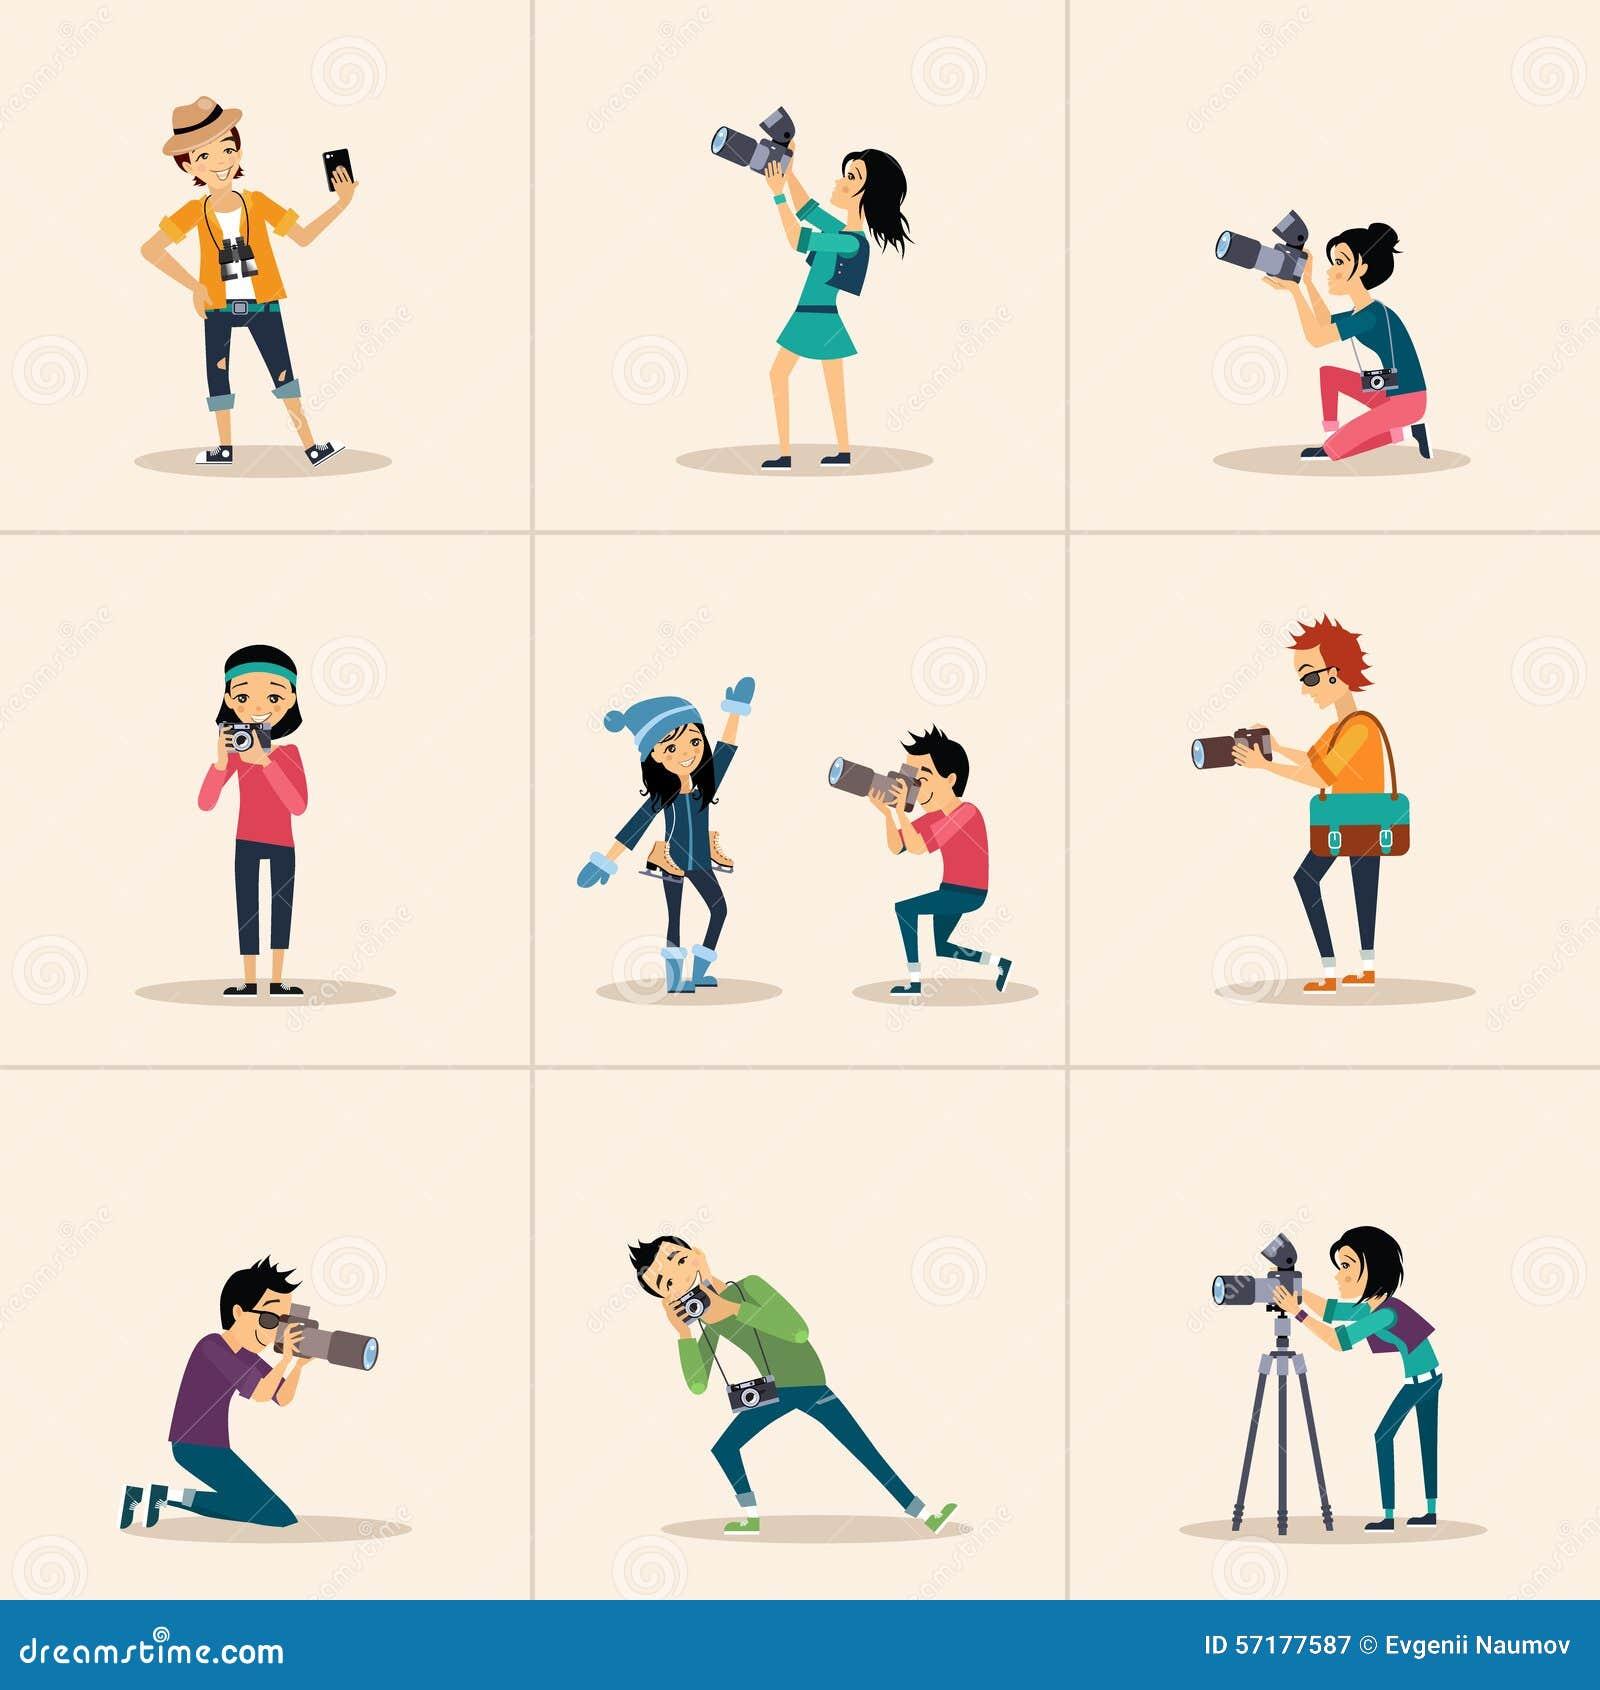 Character Design Artist Job Description : Vector creative character design posing while